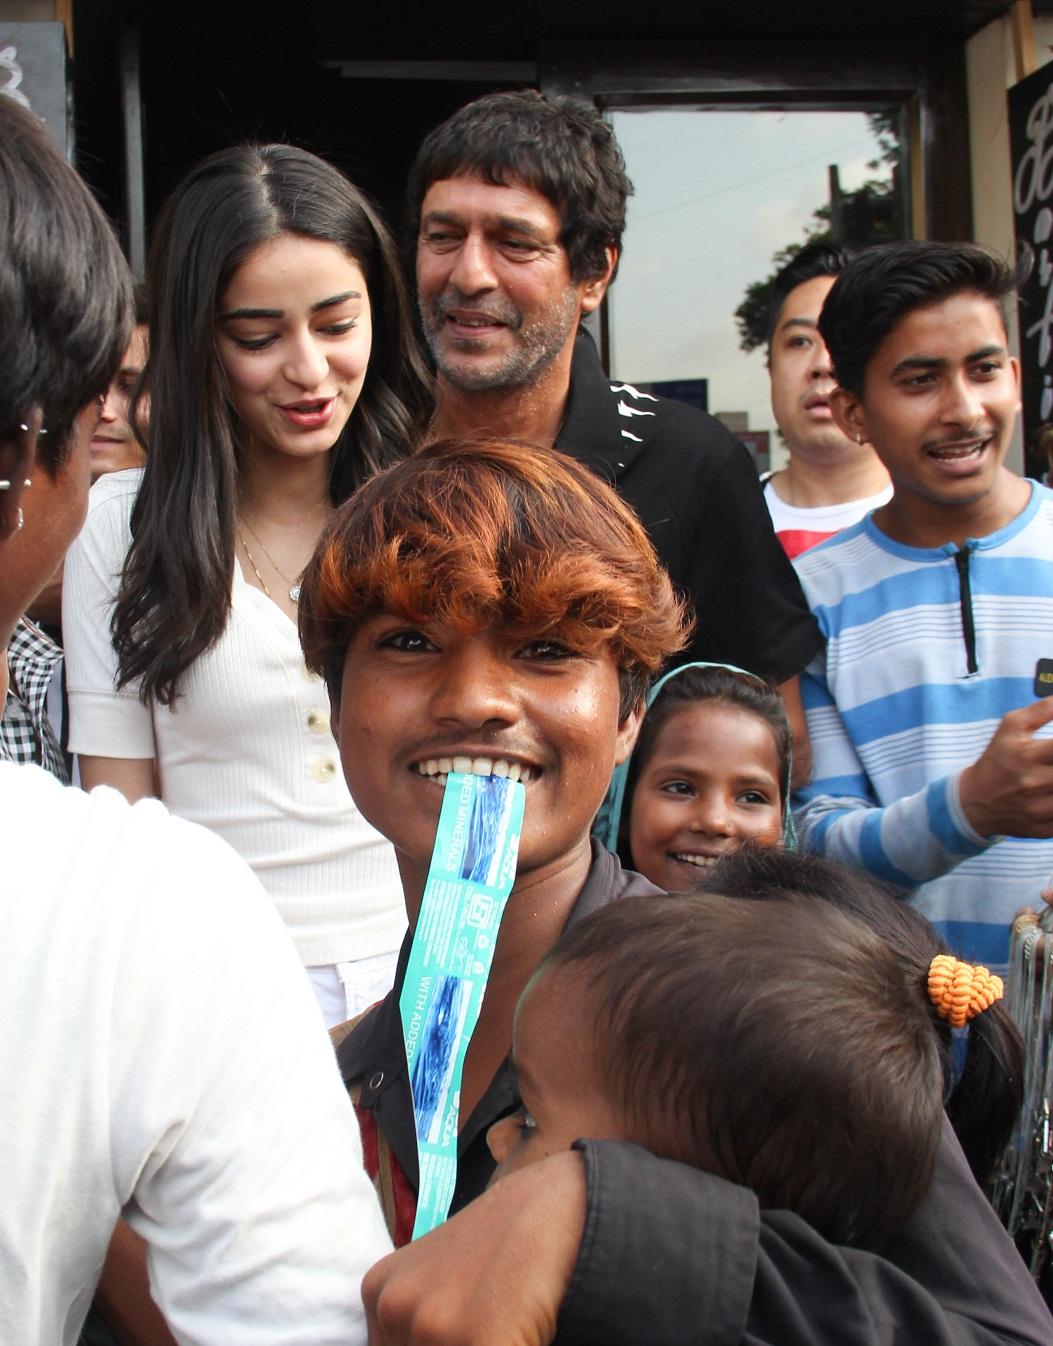 Bollywood Tadka, अनन्या पांडे इमेज, अनन्या पांडे फोटो, अनन्या पांडे पिक्चर, चंकी पांडे इमेज, चंकी पांडे फोटो, चंकी पांडे पिक्चर